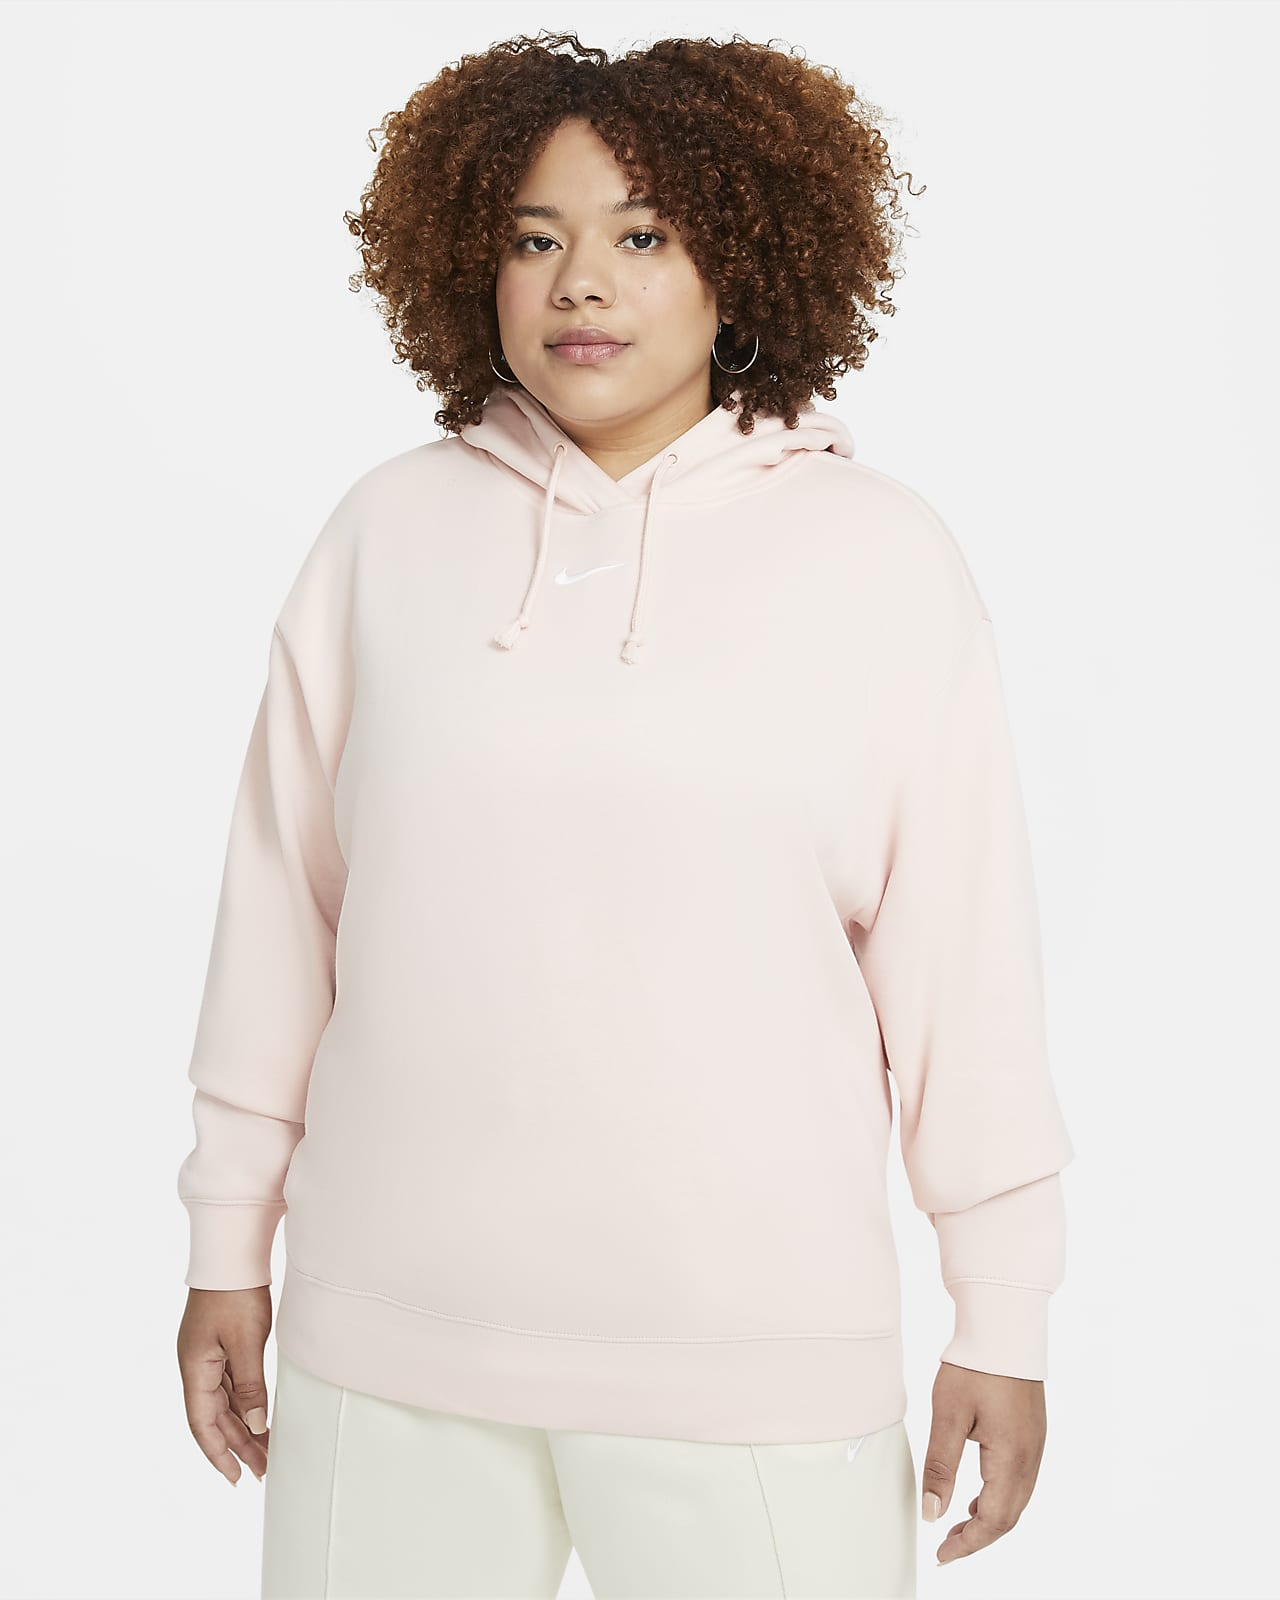 Fleecehuvtröja i oversize-modell Nike Sportswear Collection Essentials för kvinnor (Plus Size)